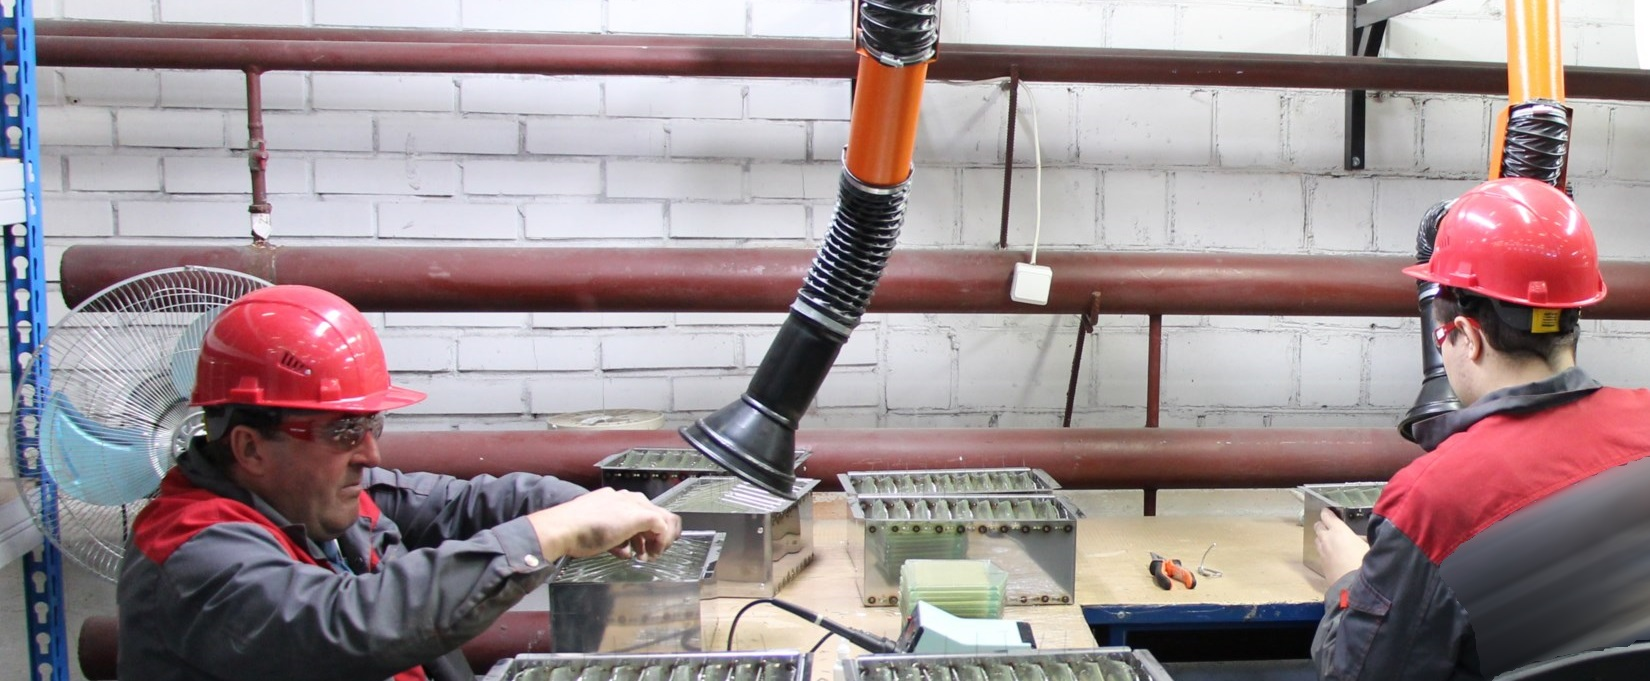 Металлообработка на станках с ЧПУ - Техмаш Украина